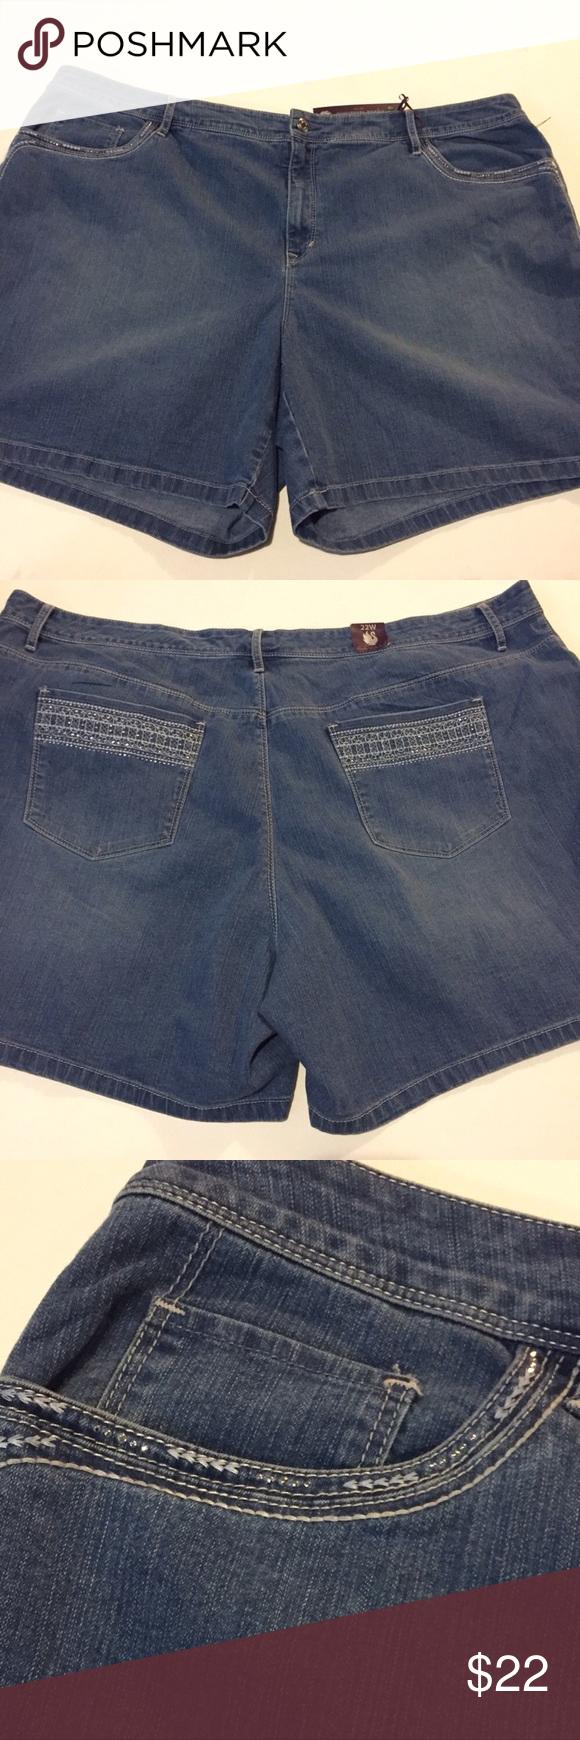 b4307f6e197 Gloria Vanderbilt Blue Jean Shorts 22W Gloria Vanderbilt Blue Jean Shorts  22W Runs large Style 'Jaqueline'. Flat Front Beautifully Spa…